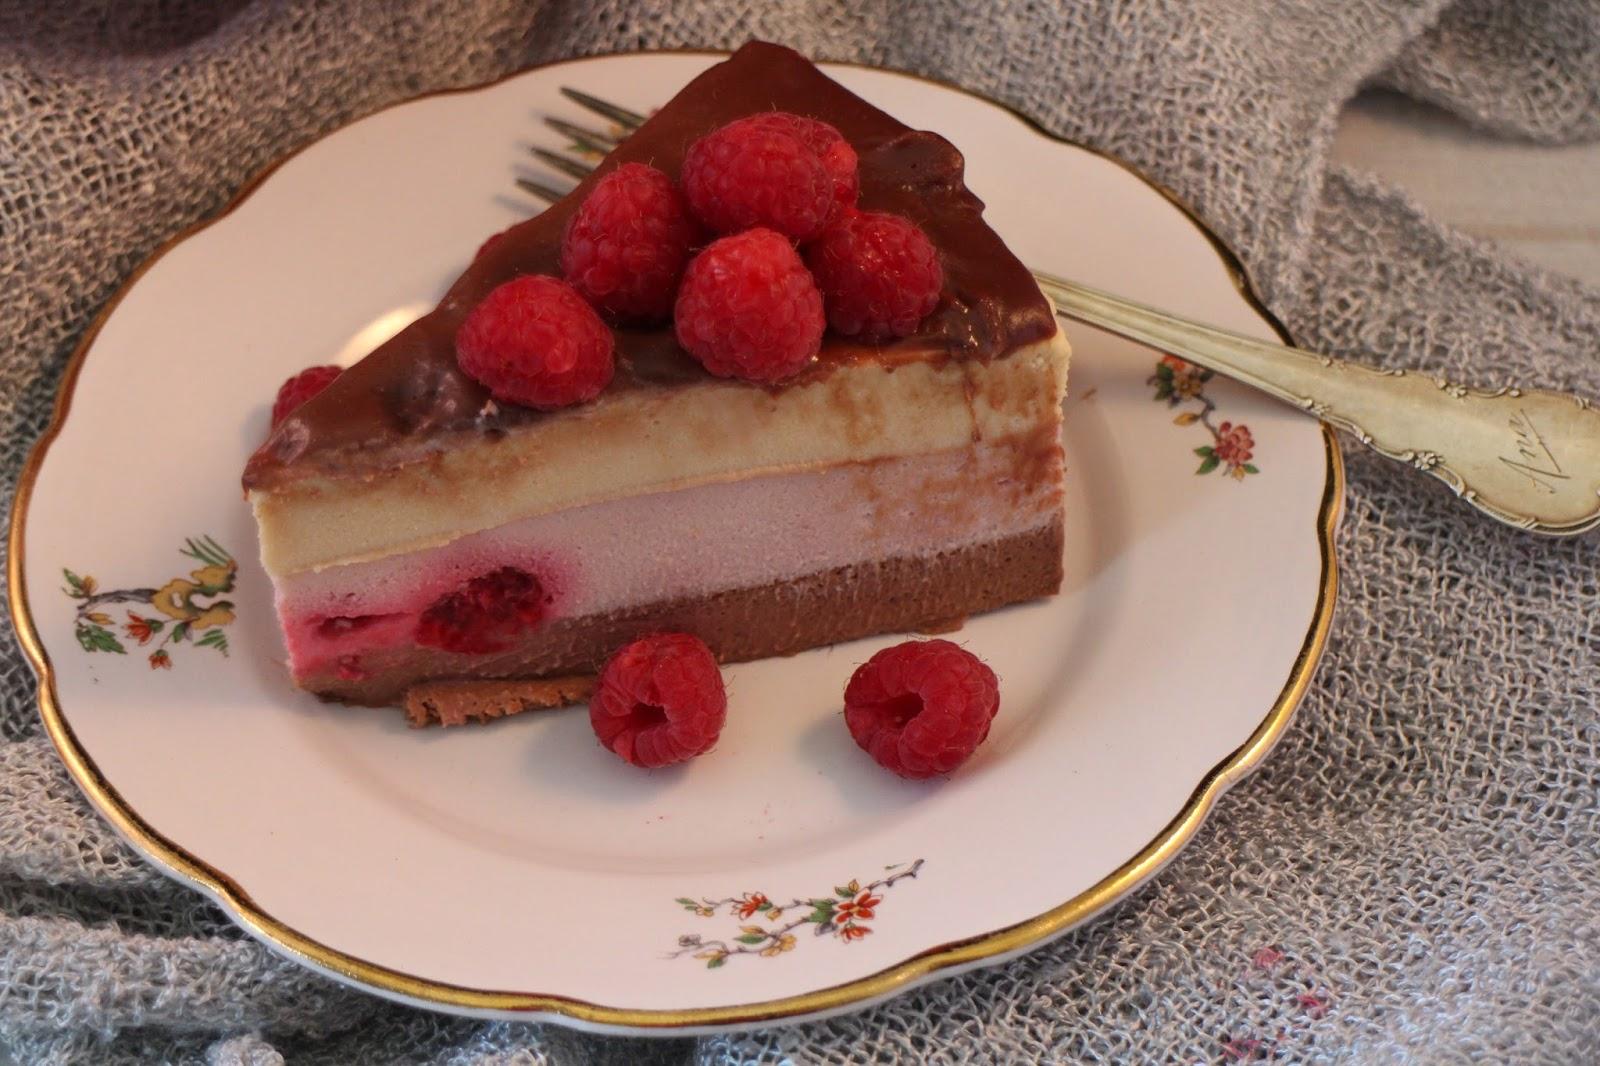 chocolate-raspberry-and-vanilla-mousse-tart, tarta-mousse-de-chocolate-frambuesas-y-vainilla